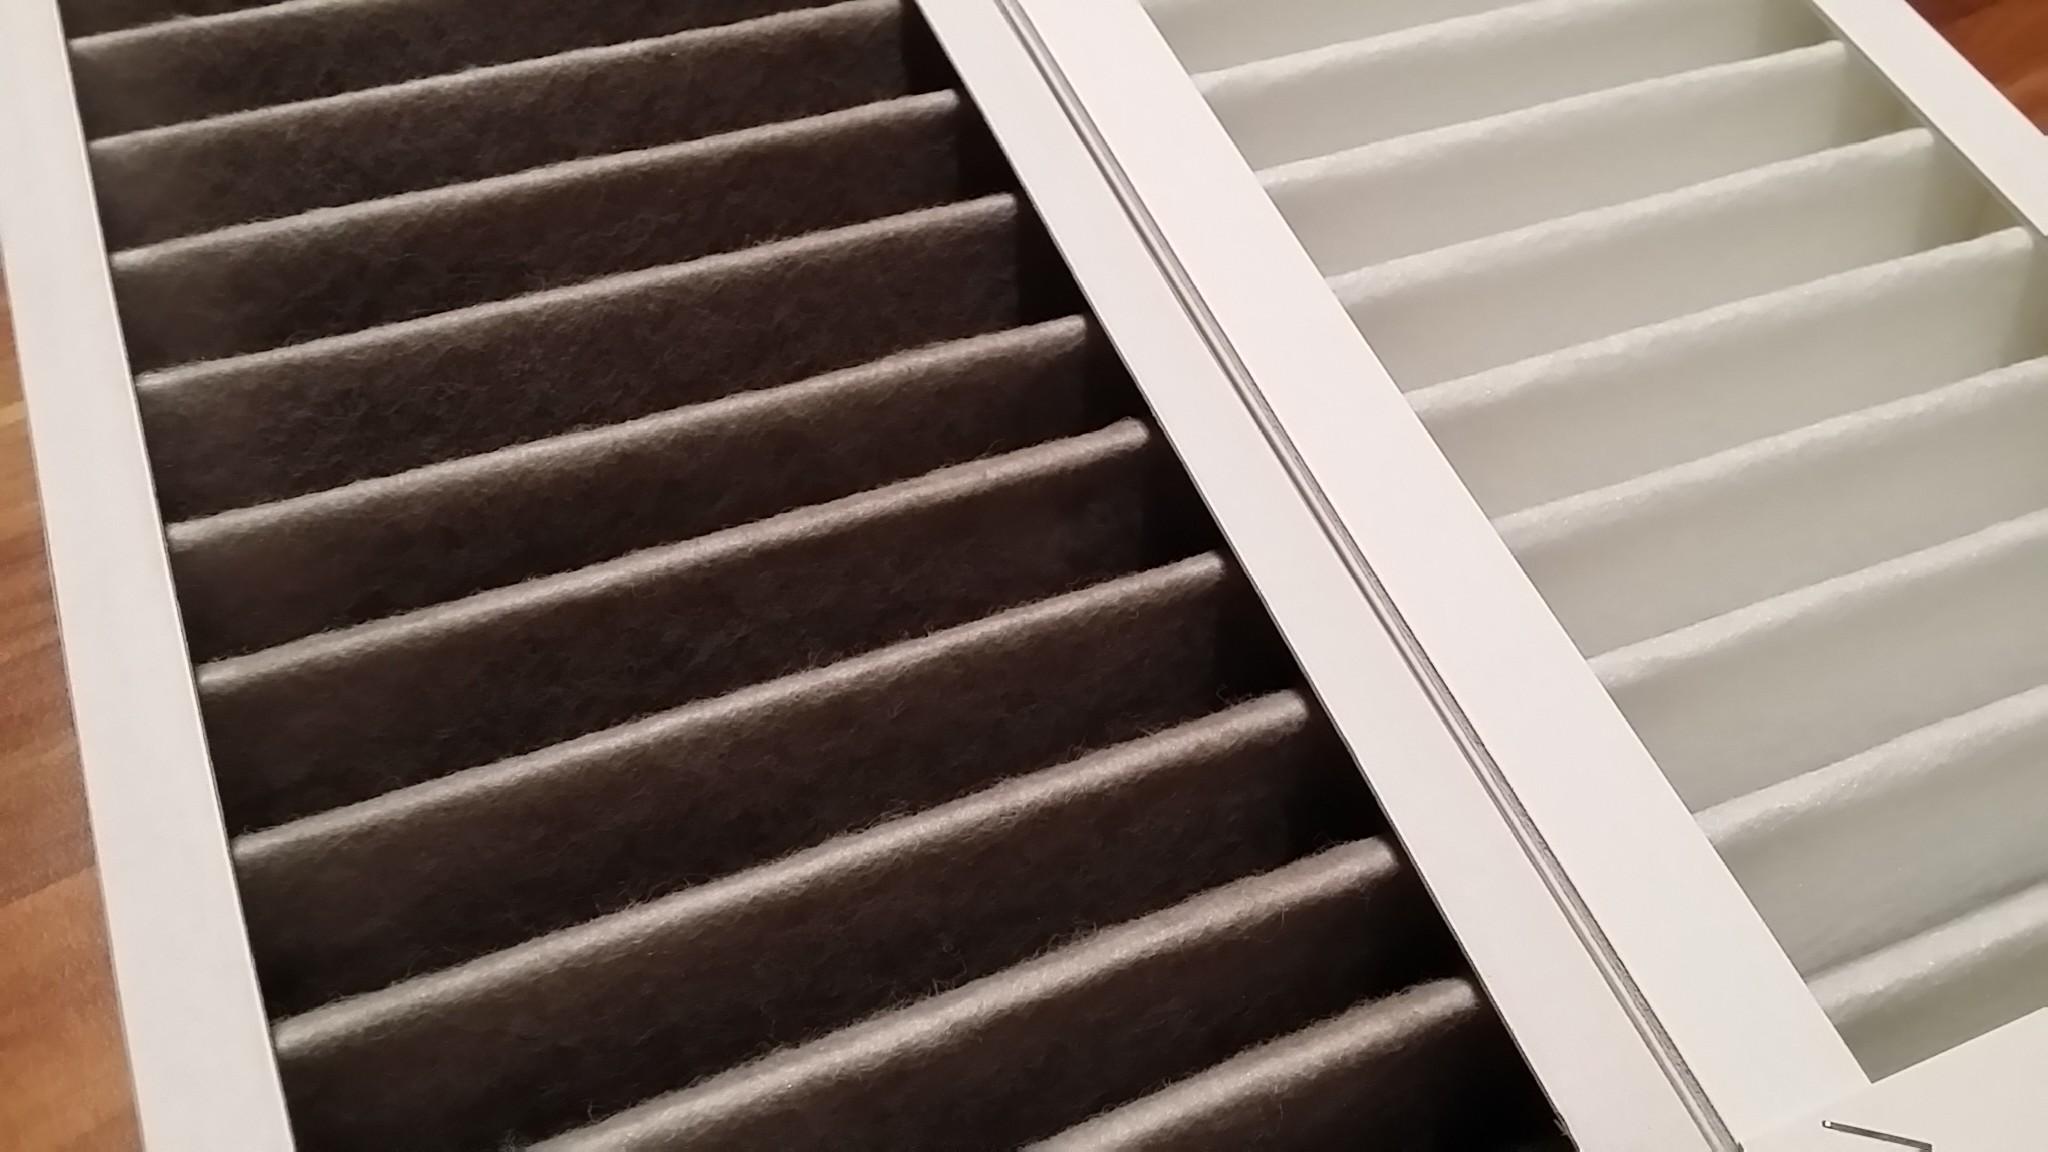 l ftungsanlage pluggit ap310 update sommerbypass hausbau in bomschtown. Black Bedroom Furniture Sets. Home Design Ideas